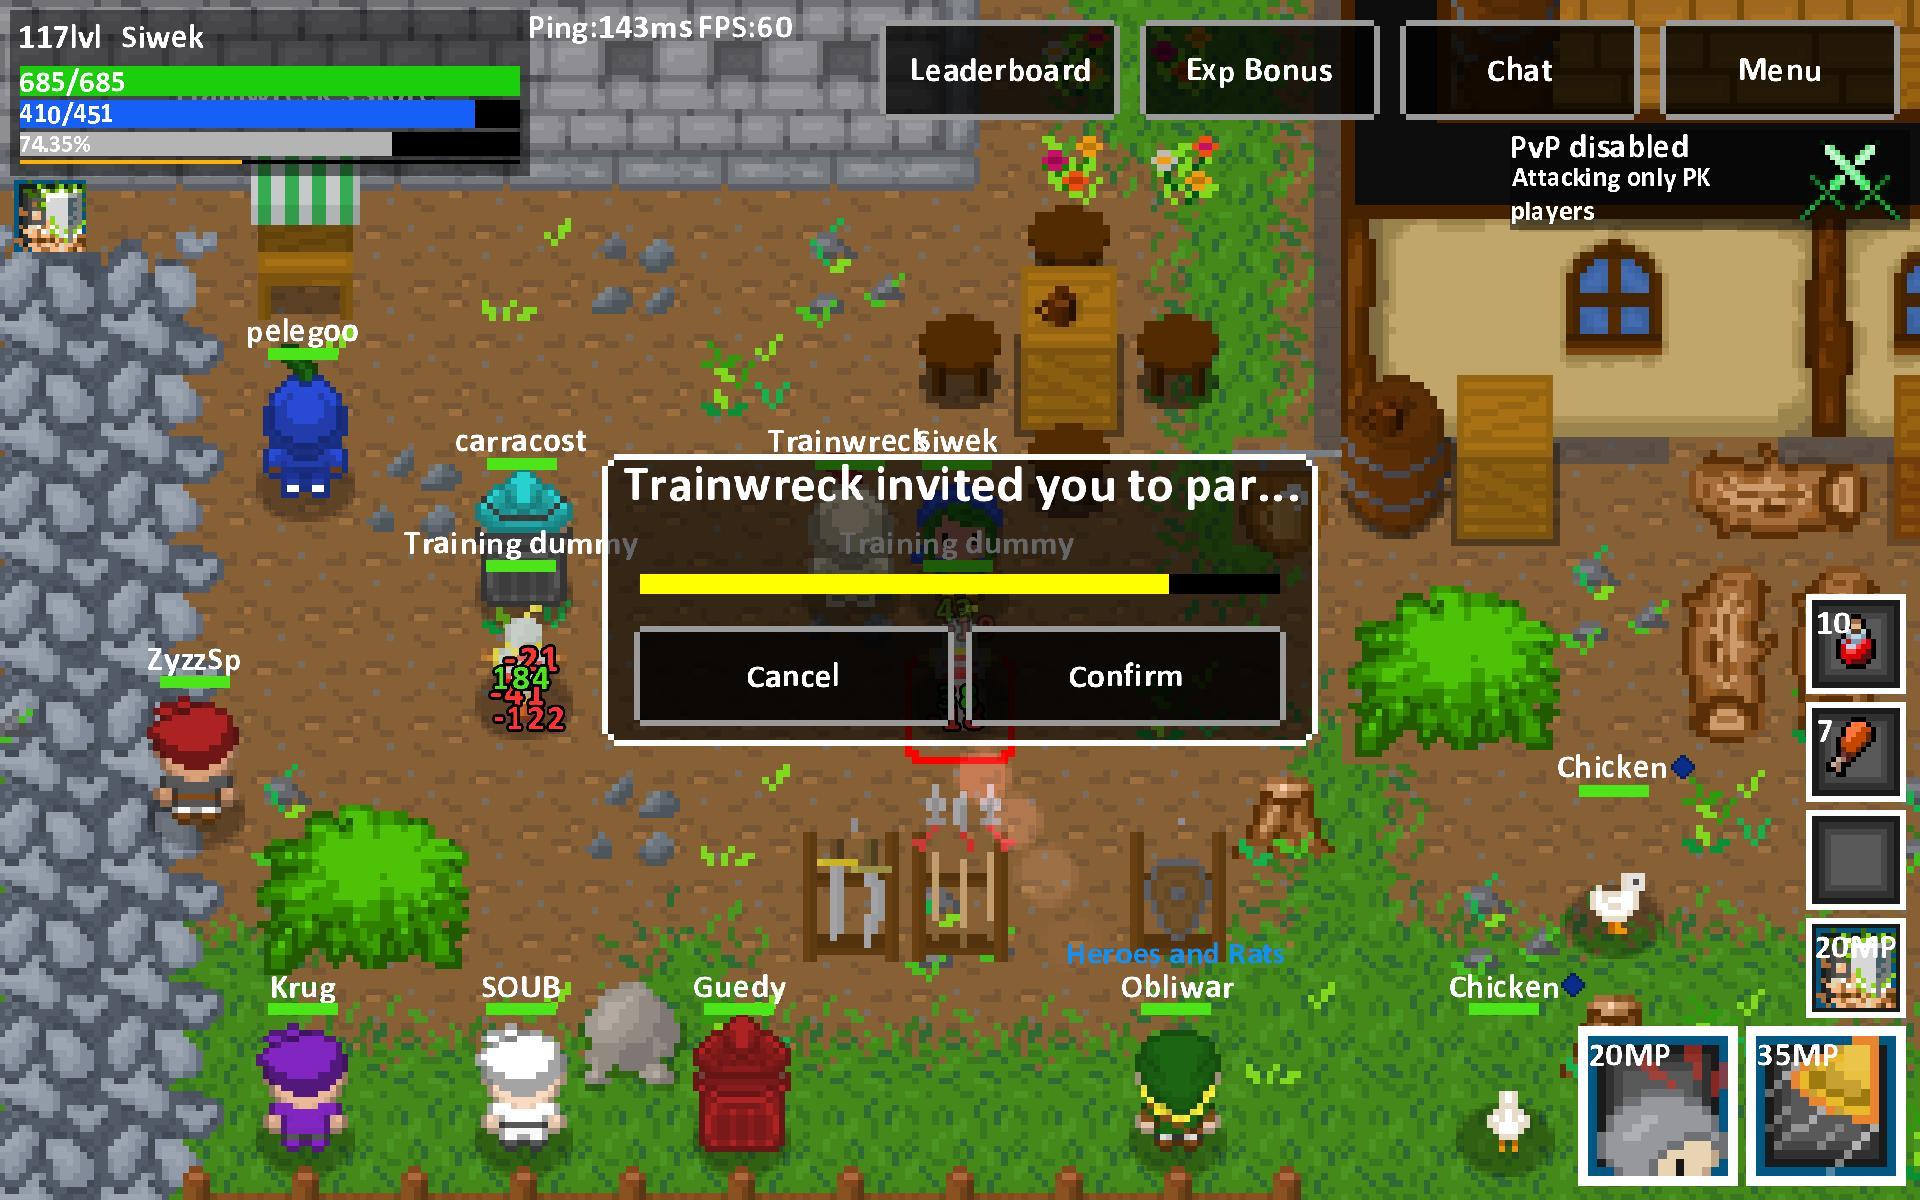 Heroes & Rats MMORPG Online 0.32.2 Screenshot 20